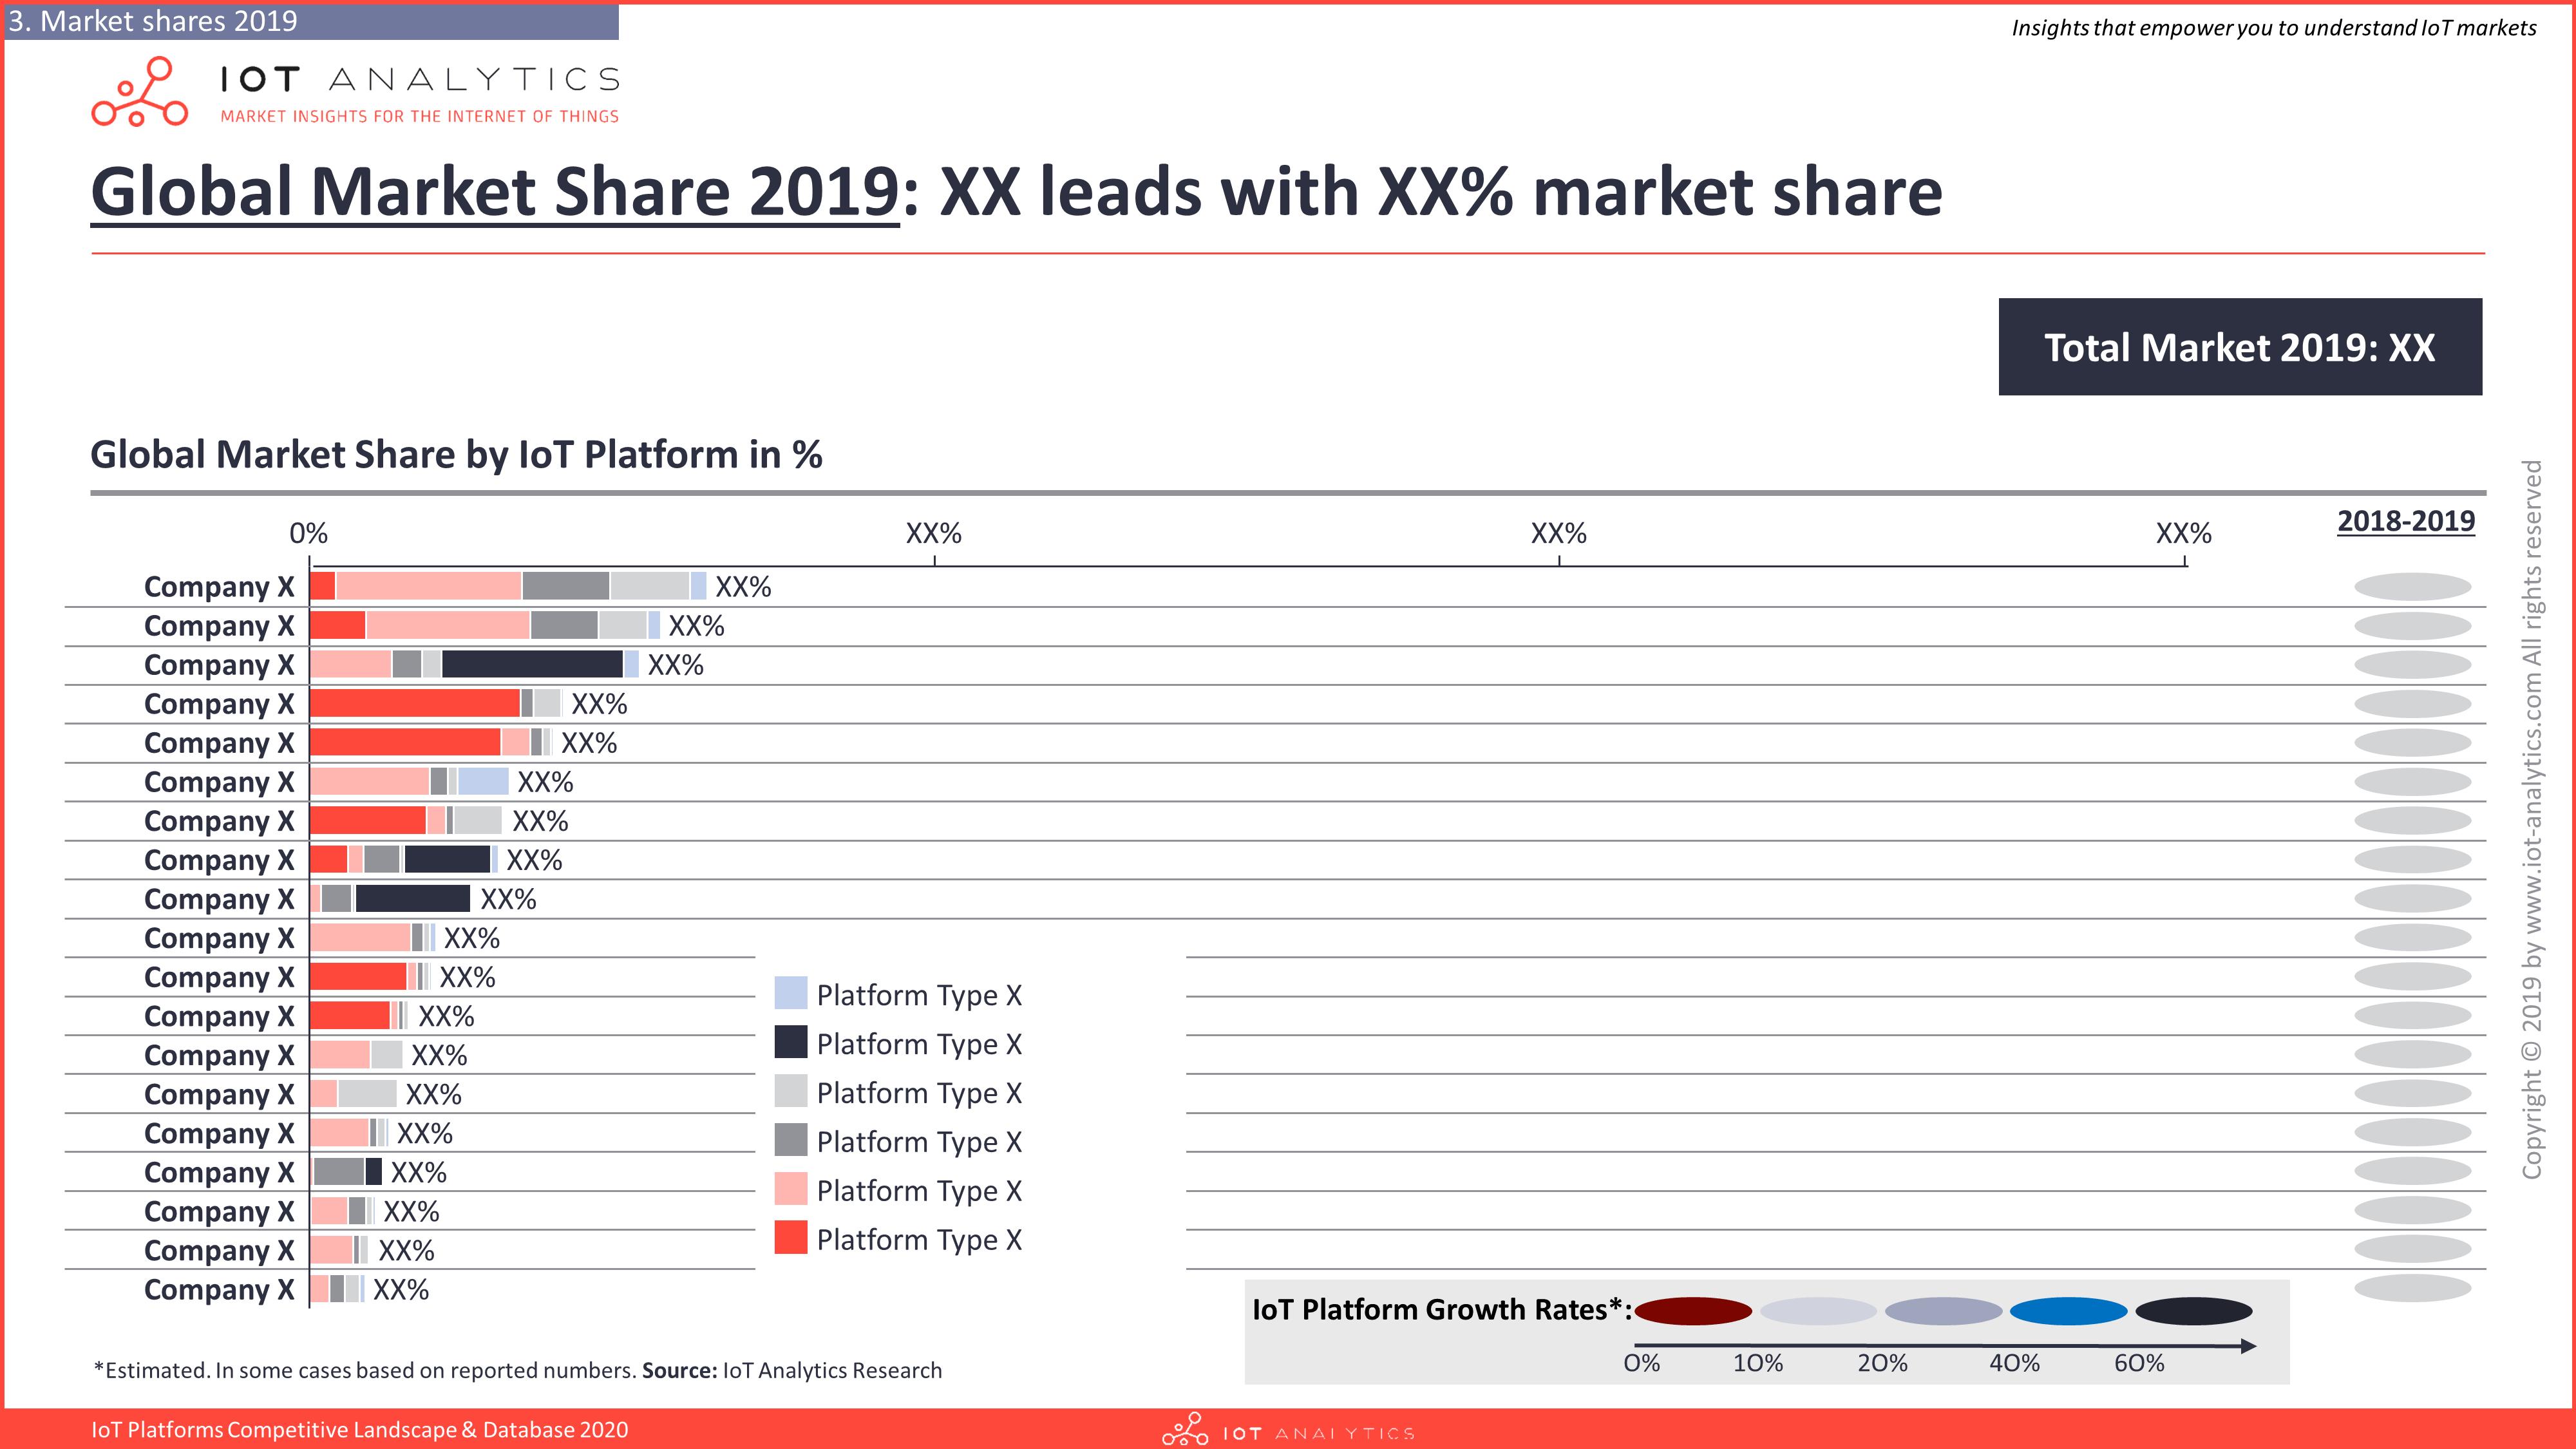 IoT Platforms Company Landscape & Database 2020 - by share-min